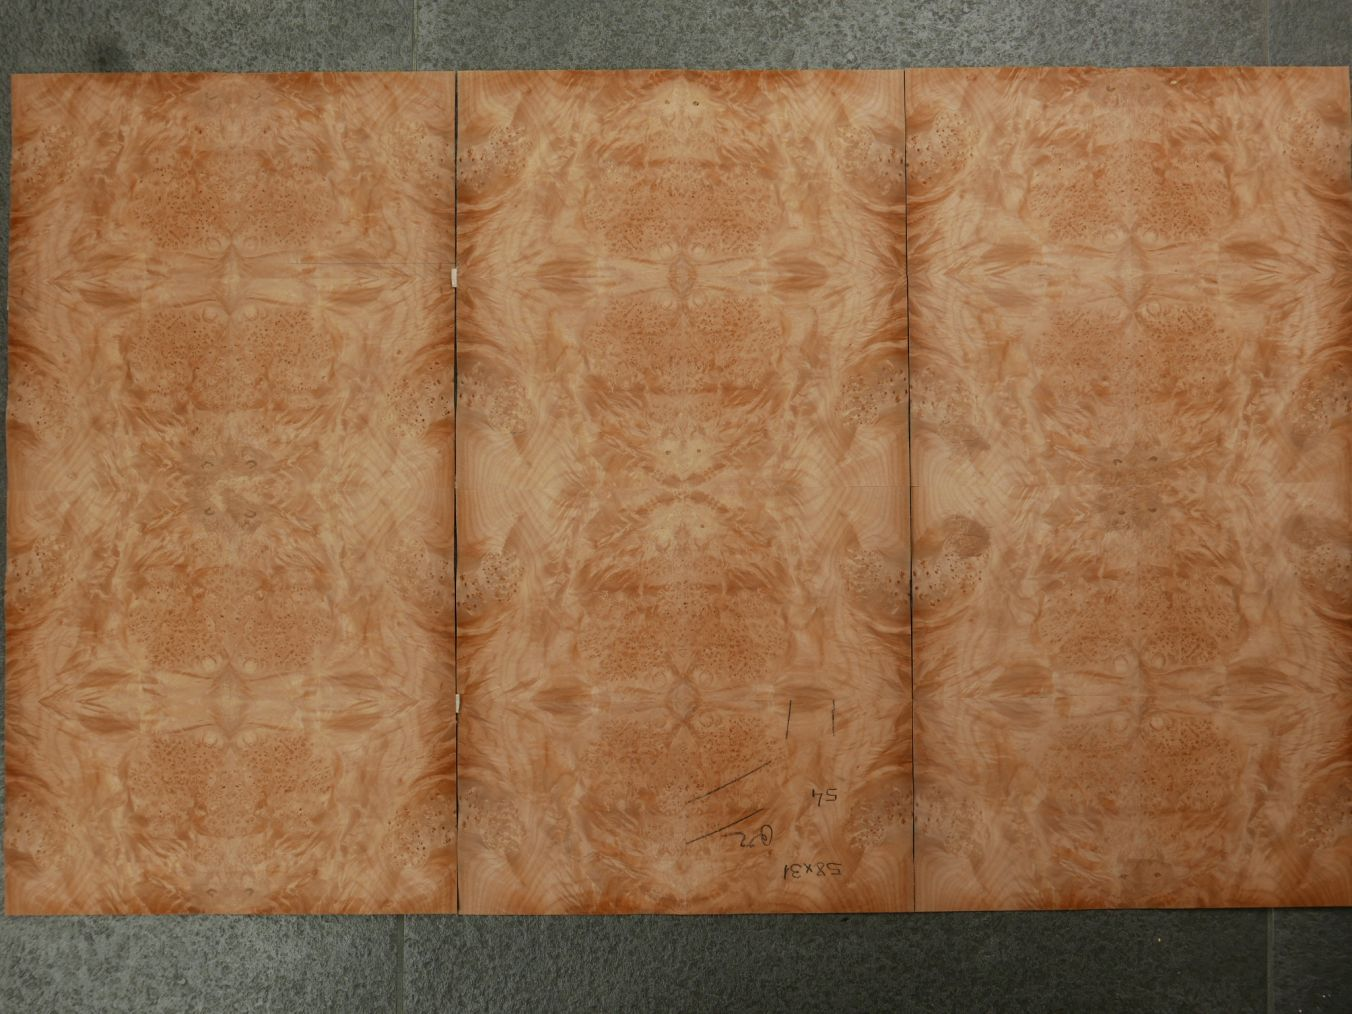 GW086-3 Gevoegd Amerikaans Esdoorn Wortel 31x58cm 3st